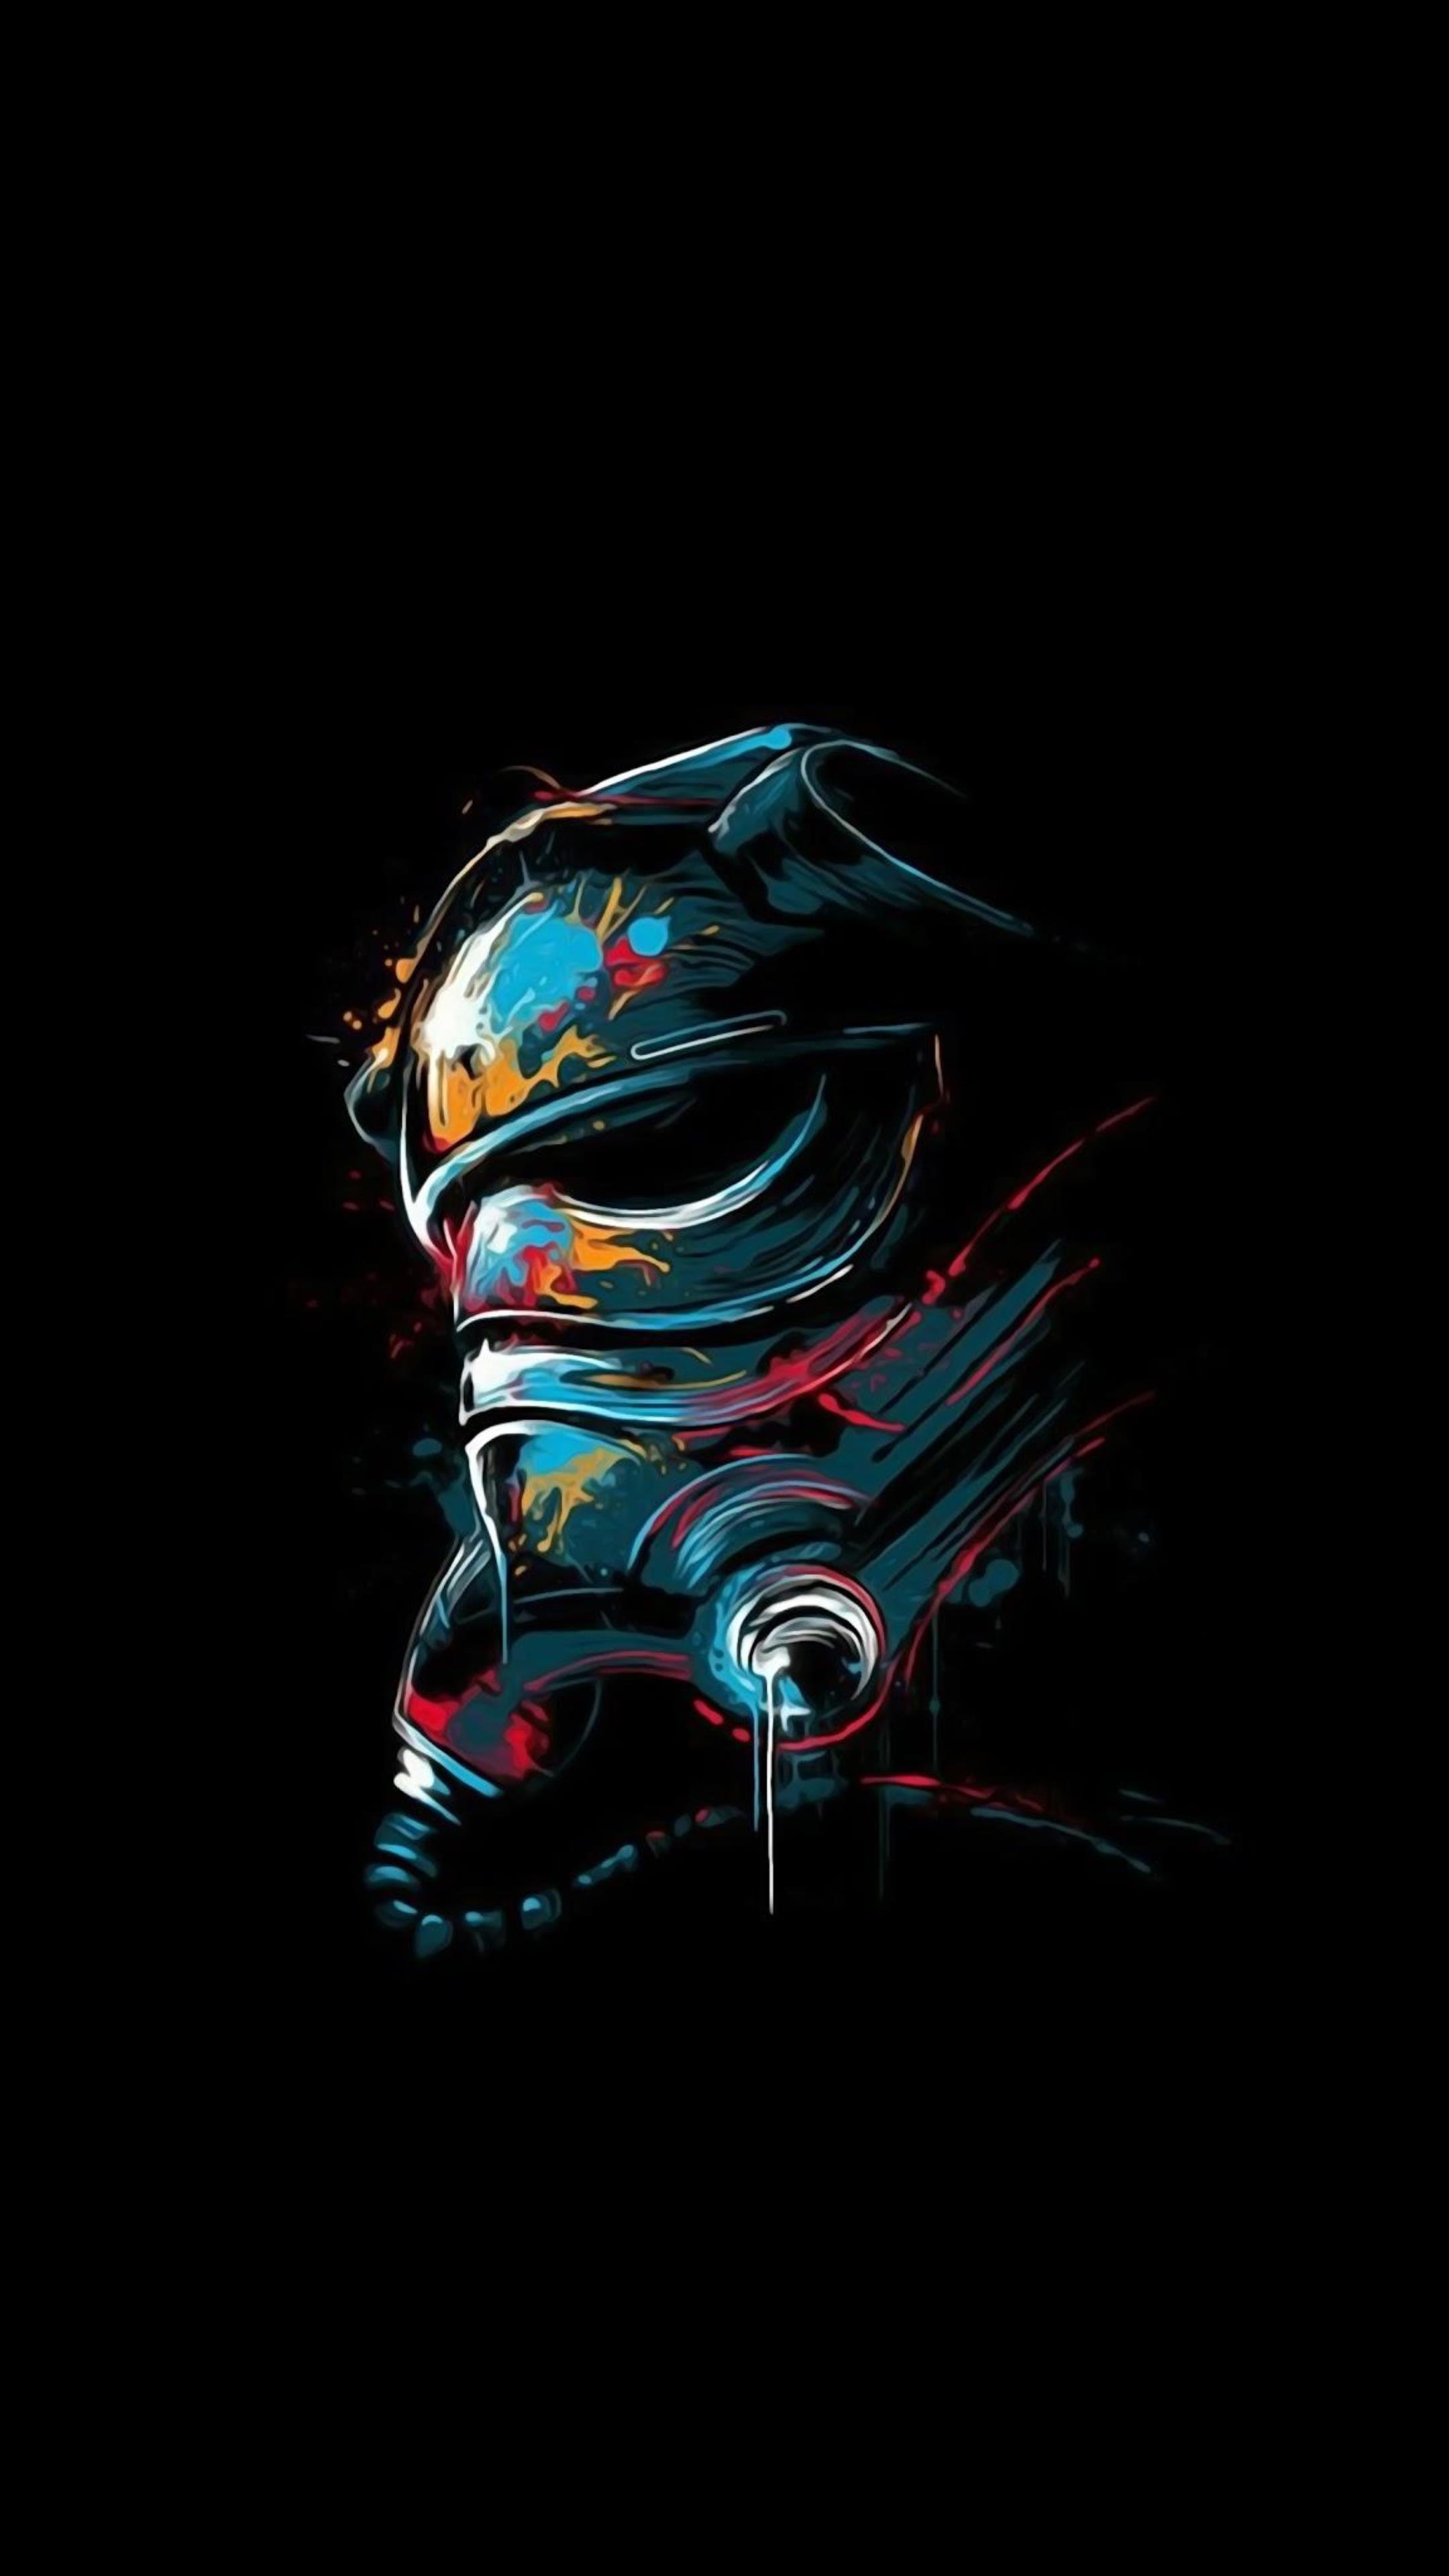 Stormtrooper Paint Splatter 2160x3840 Star Wars Background Star Wars Painting Star Wars Wallpaper